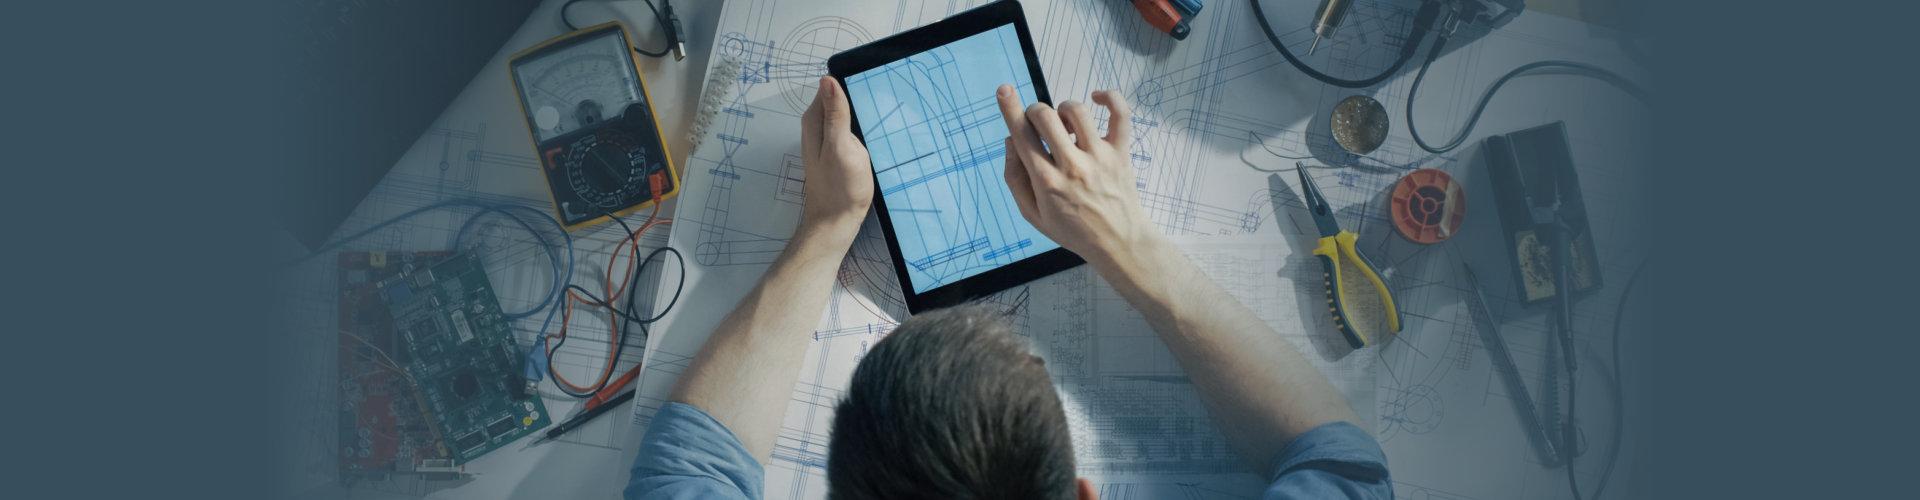 technician working on blueprints